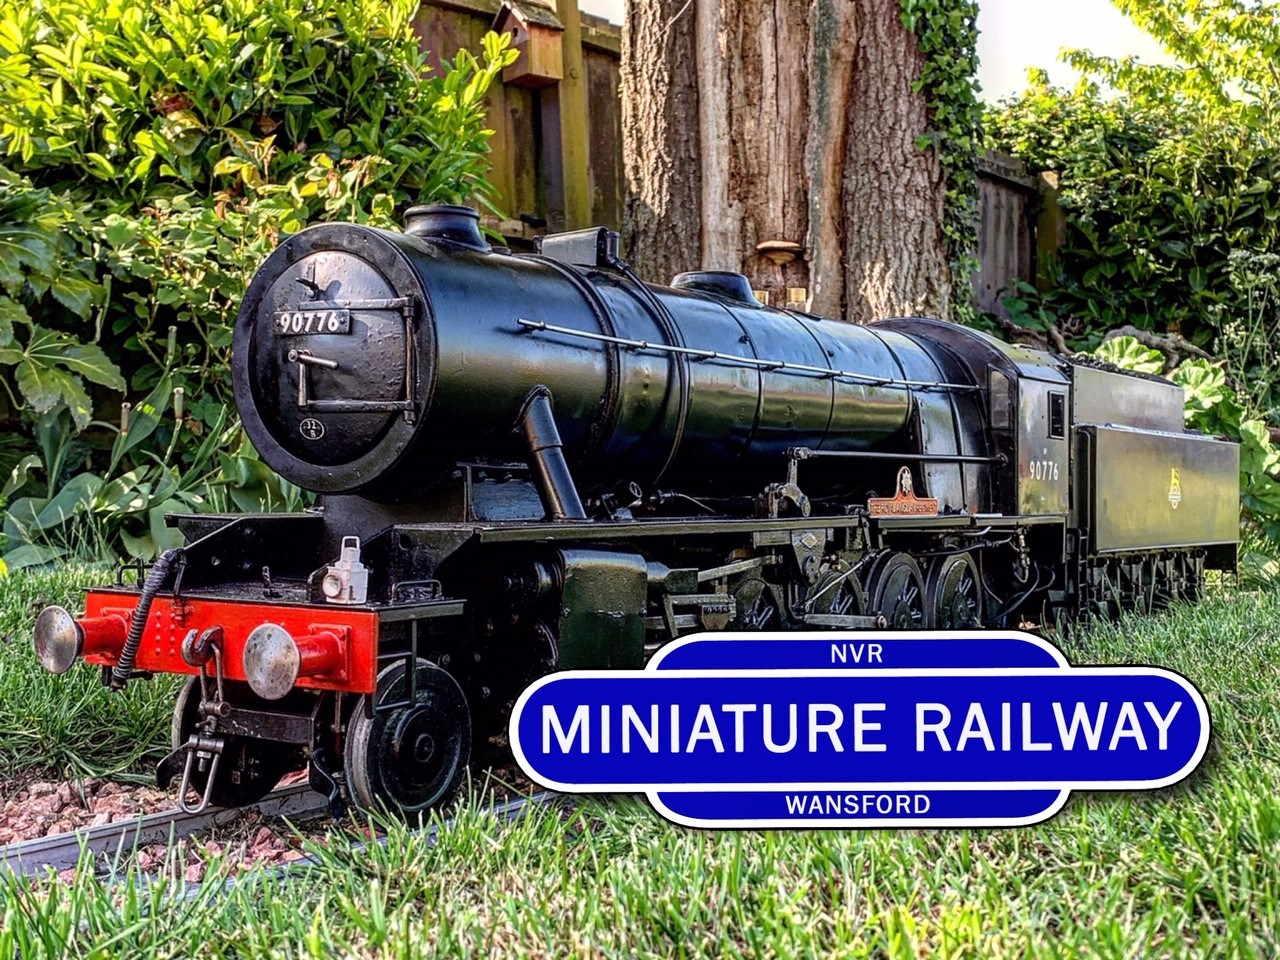 Wansford Miniature Railway